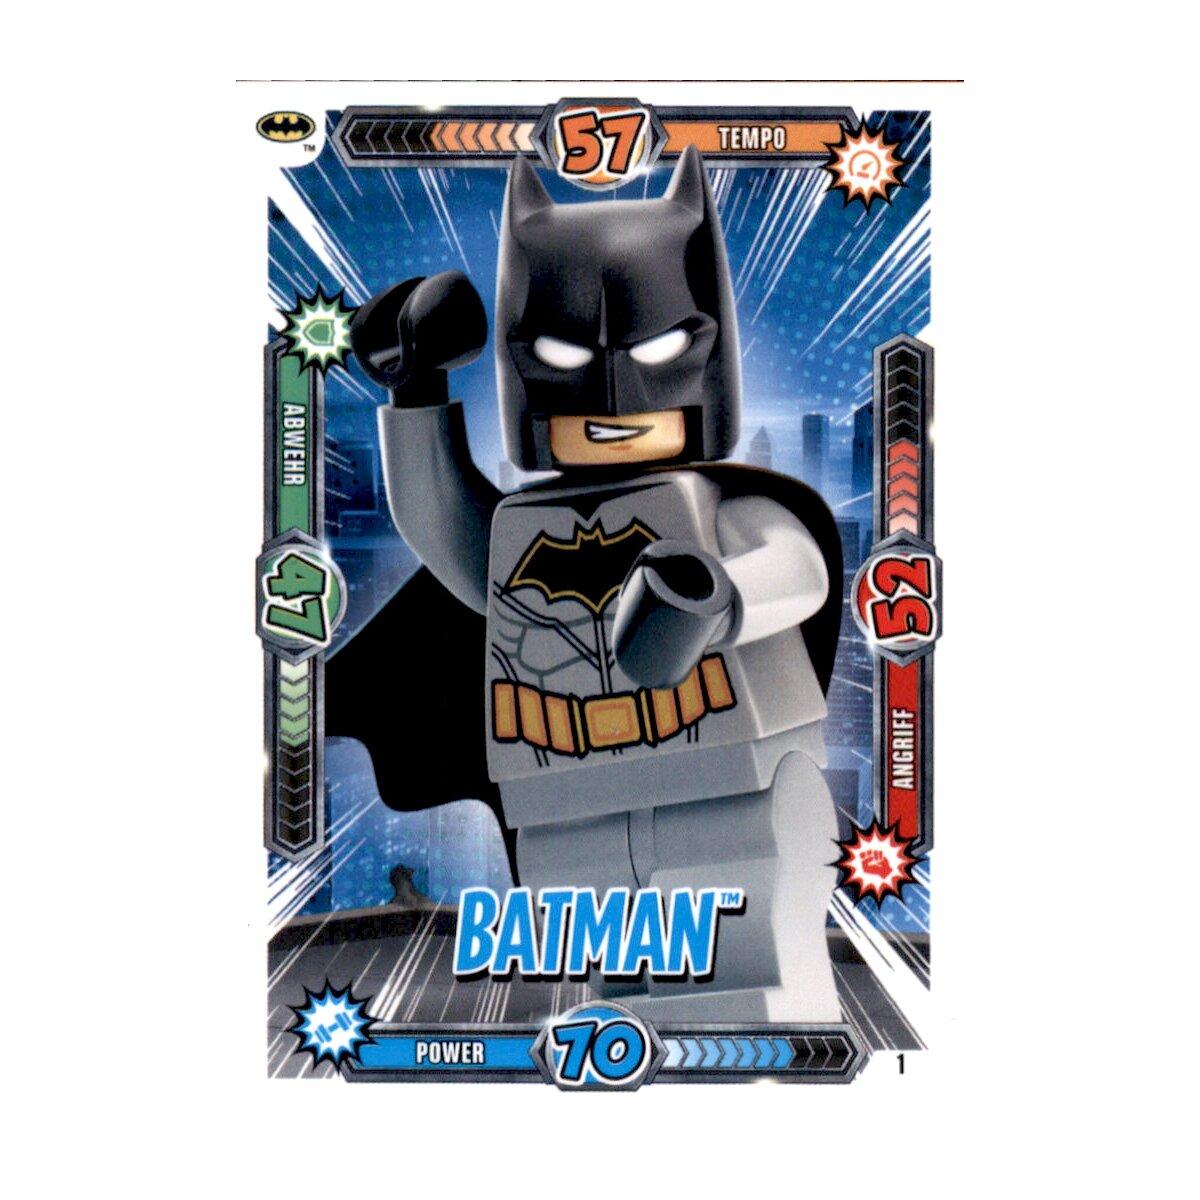 Lego BATMAN MOVIE CARDS no LE1-Batman-Limited Edition